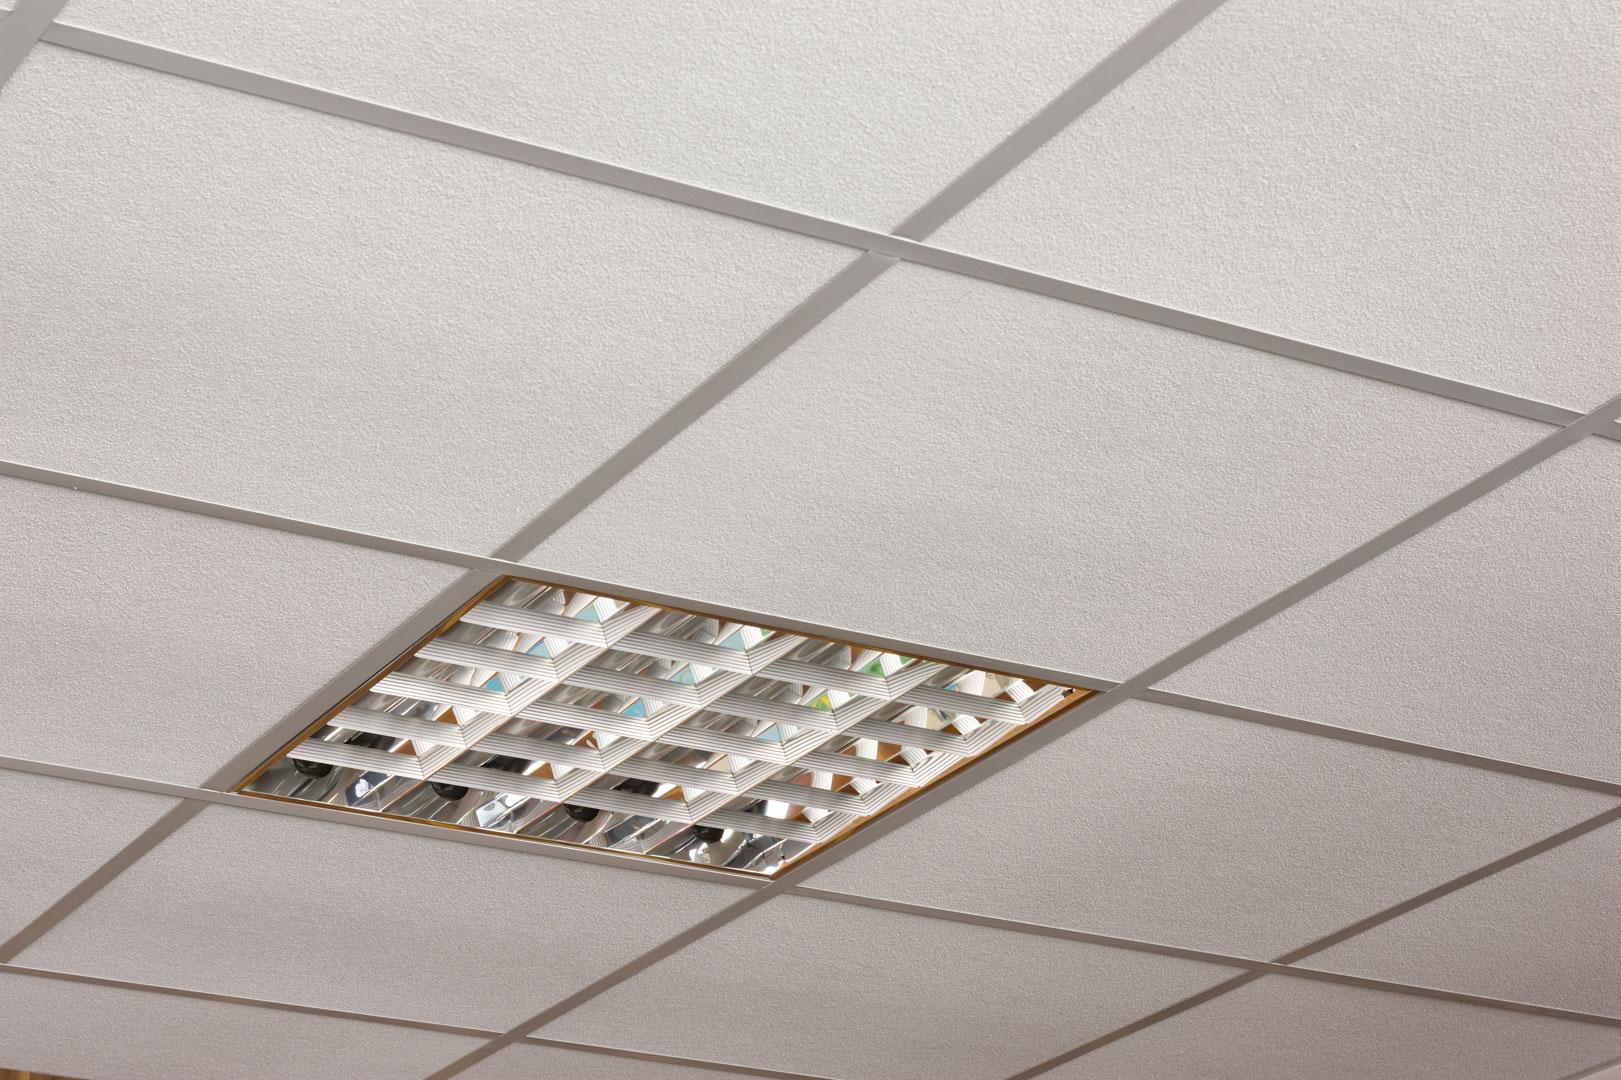 Drop ceiling tiles for bathroom - Drop Ceiling Tiles Ceiling Tiles Ceilings The Home Depot Batipro Ltd